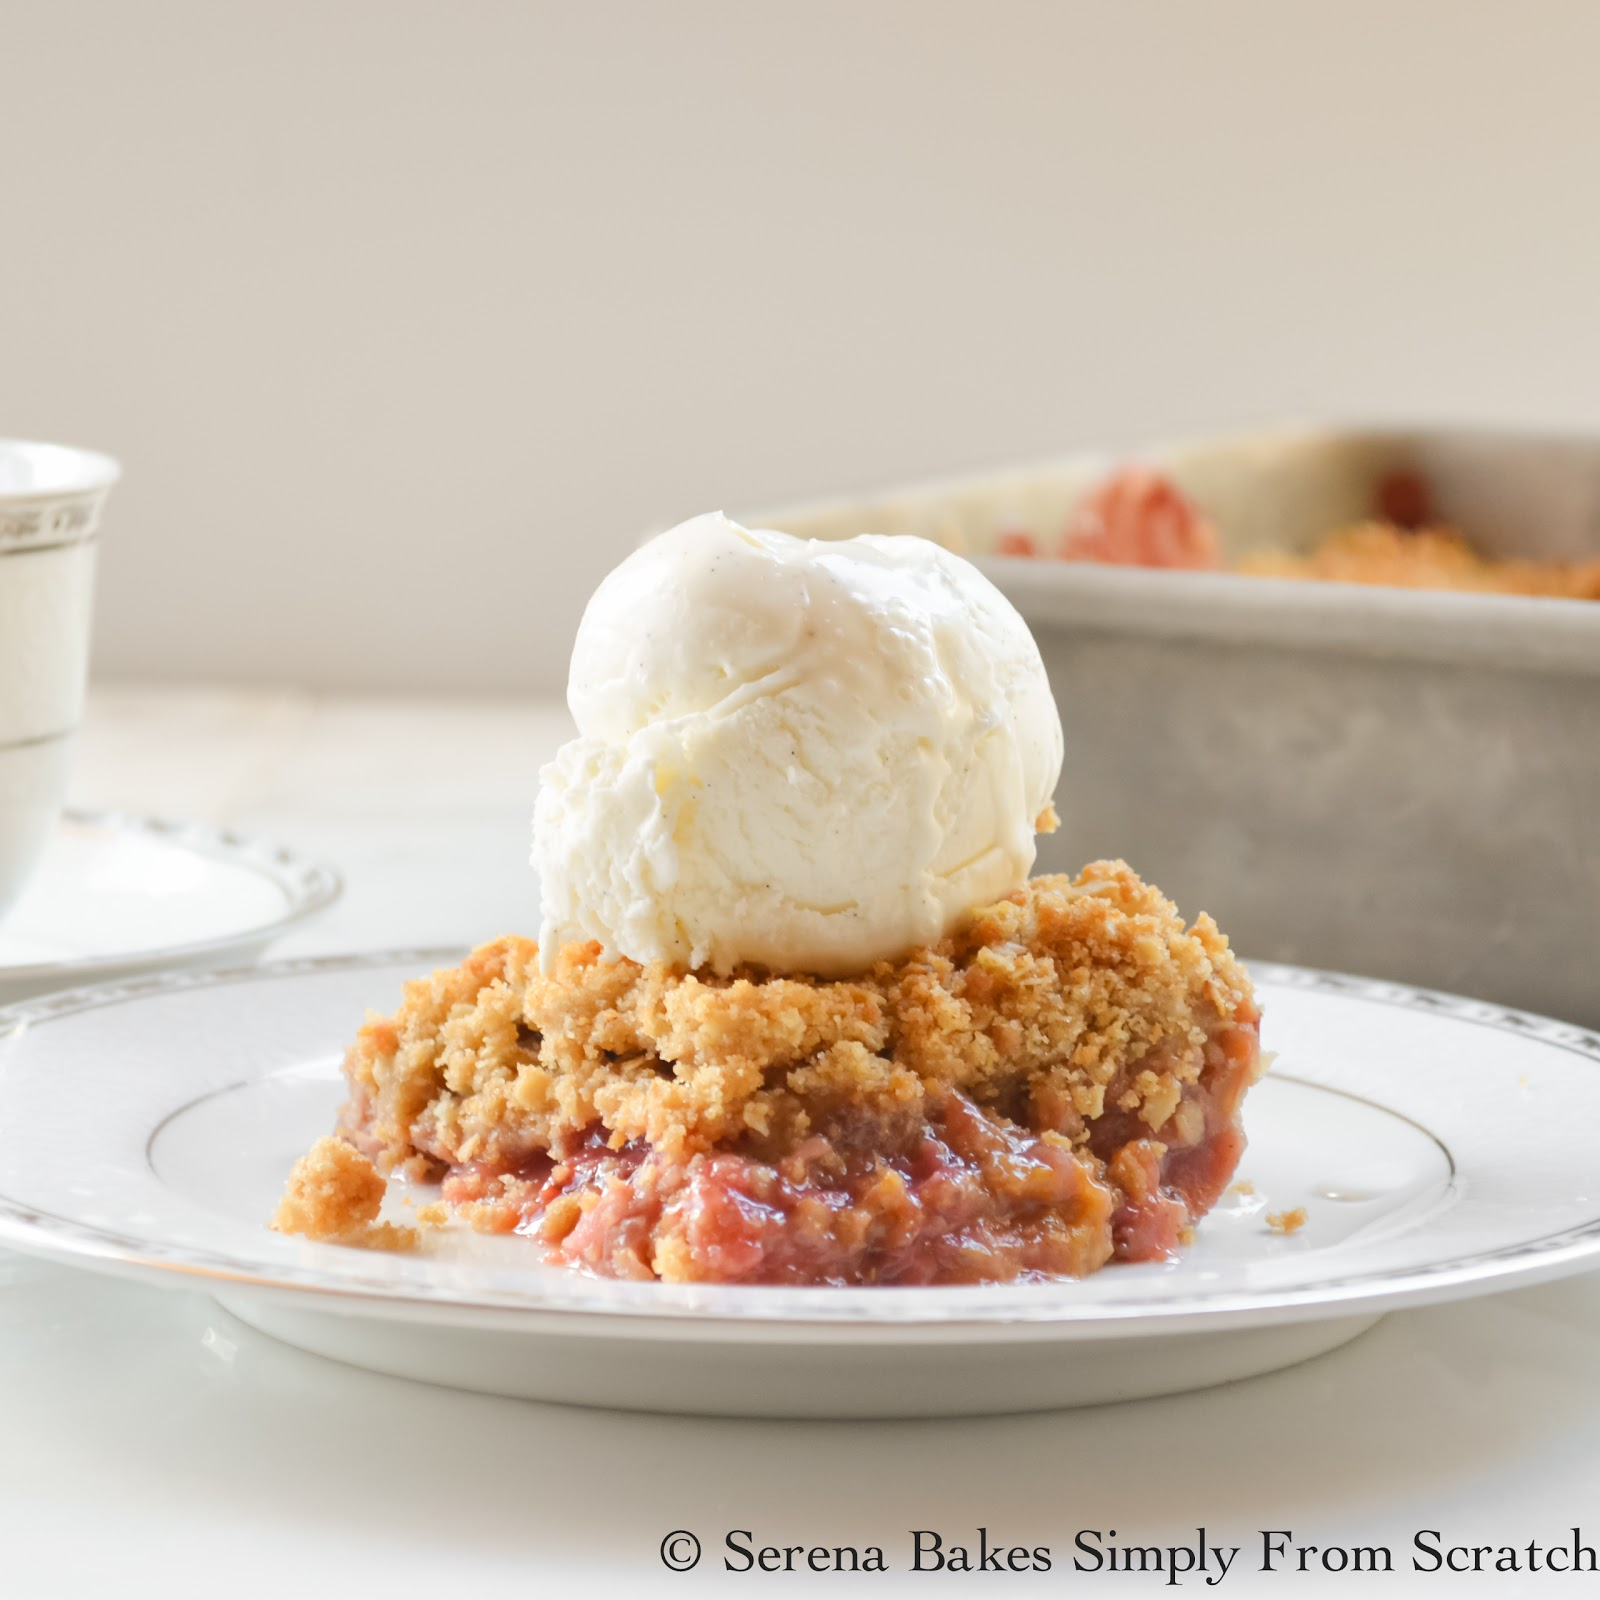 Strawberry Rhubarb Crisp my husbands all time favorite dessert!